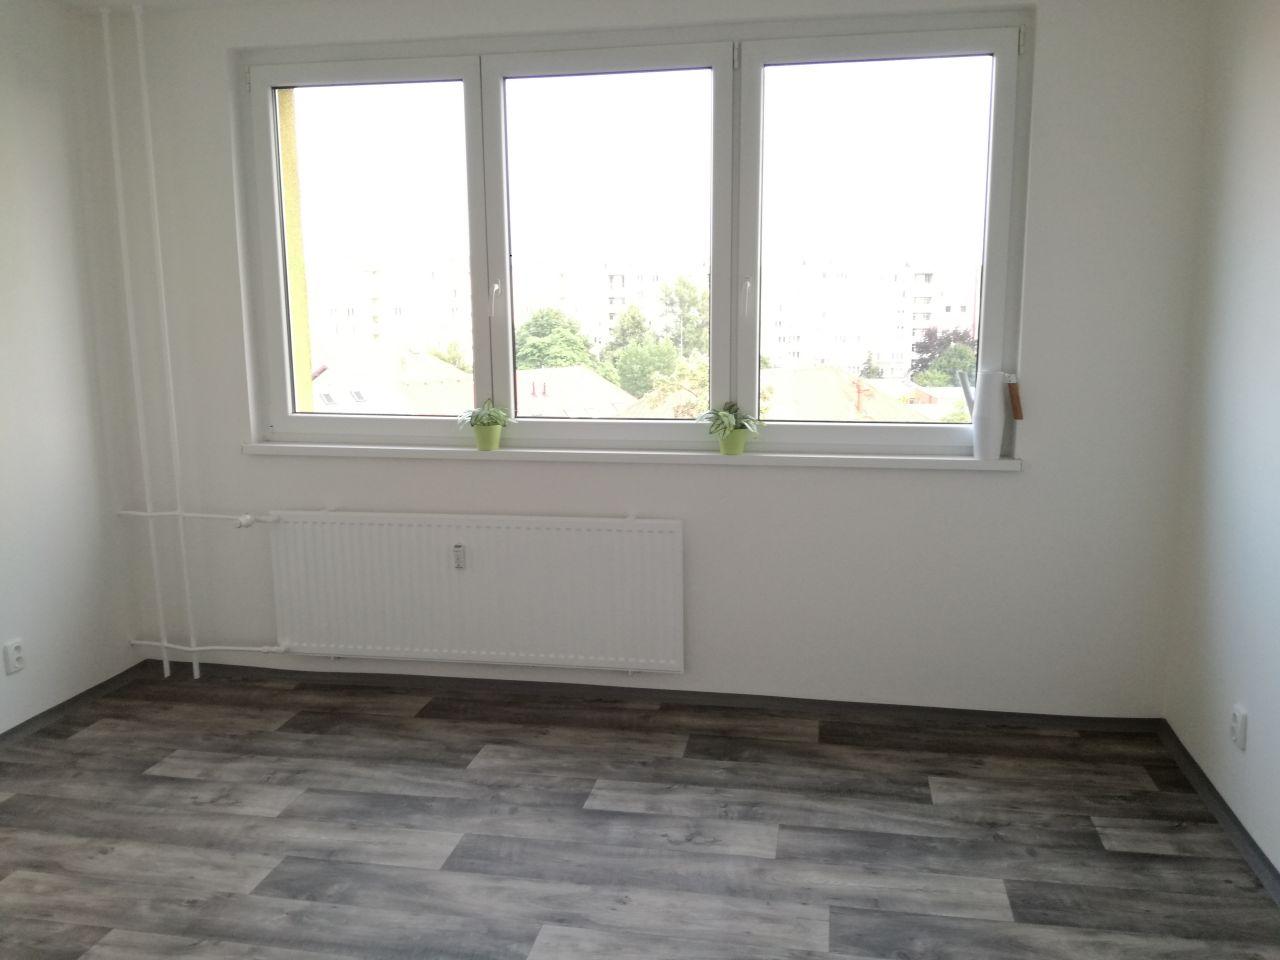 Pronájem bytu 2+1 44 m2, ul. Sládkova 3049/22, Ostrava - Fifejdy